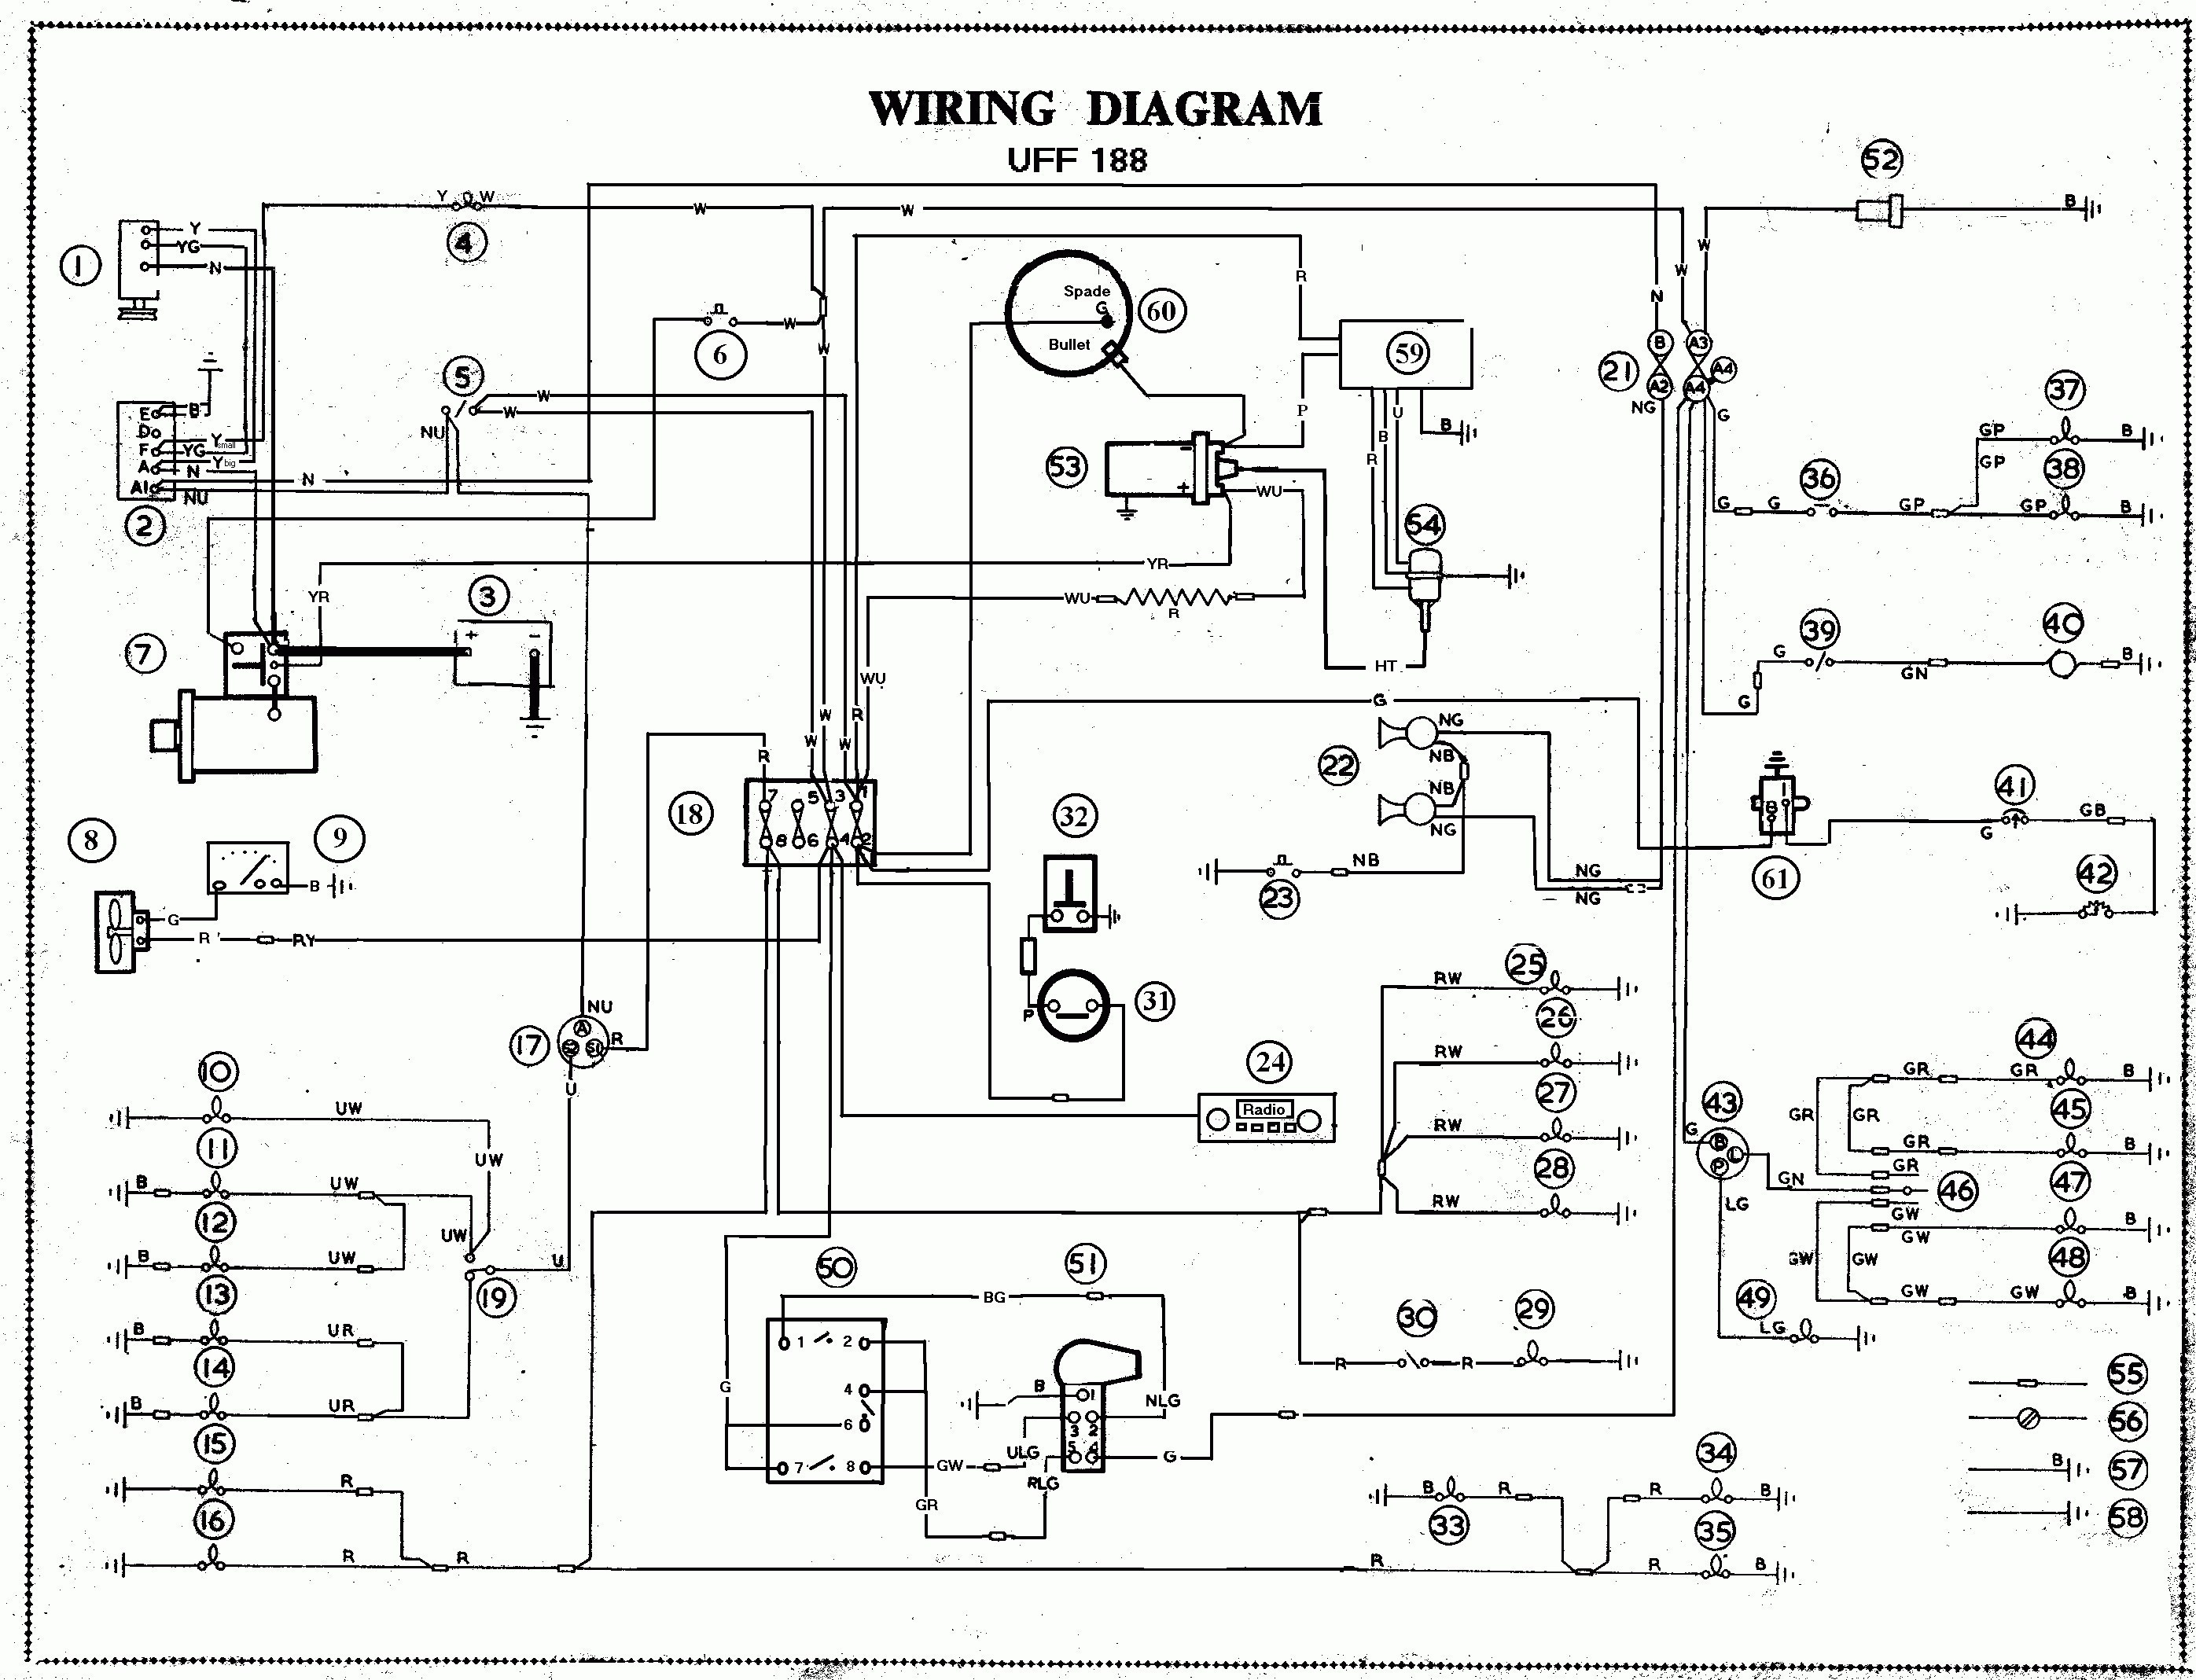 [WQZT_9871]  537D Crest Pontoon Boat Wiring Diagram | Wiring Library | Voyager Pontoon Boat Wiring Diagram |  | Wiring Library